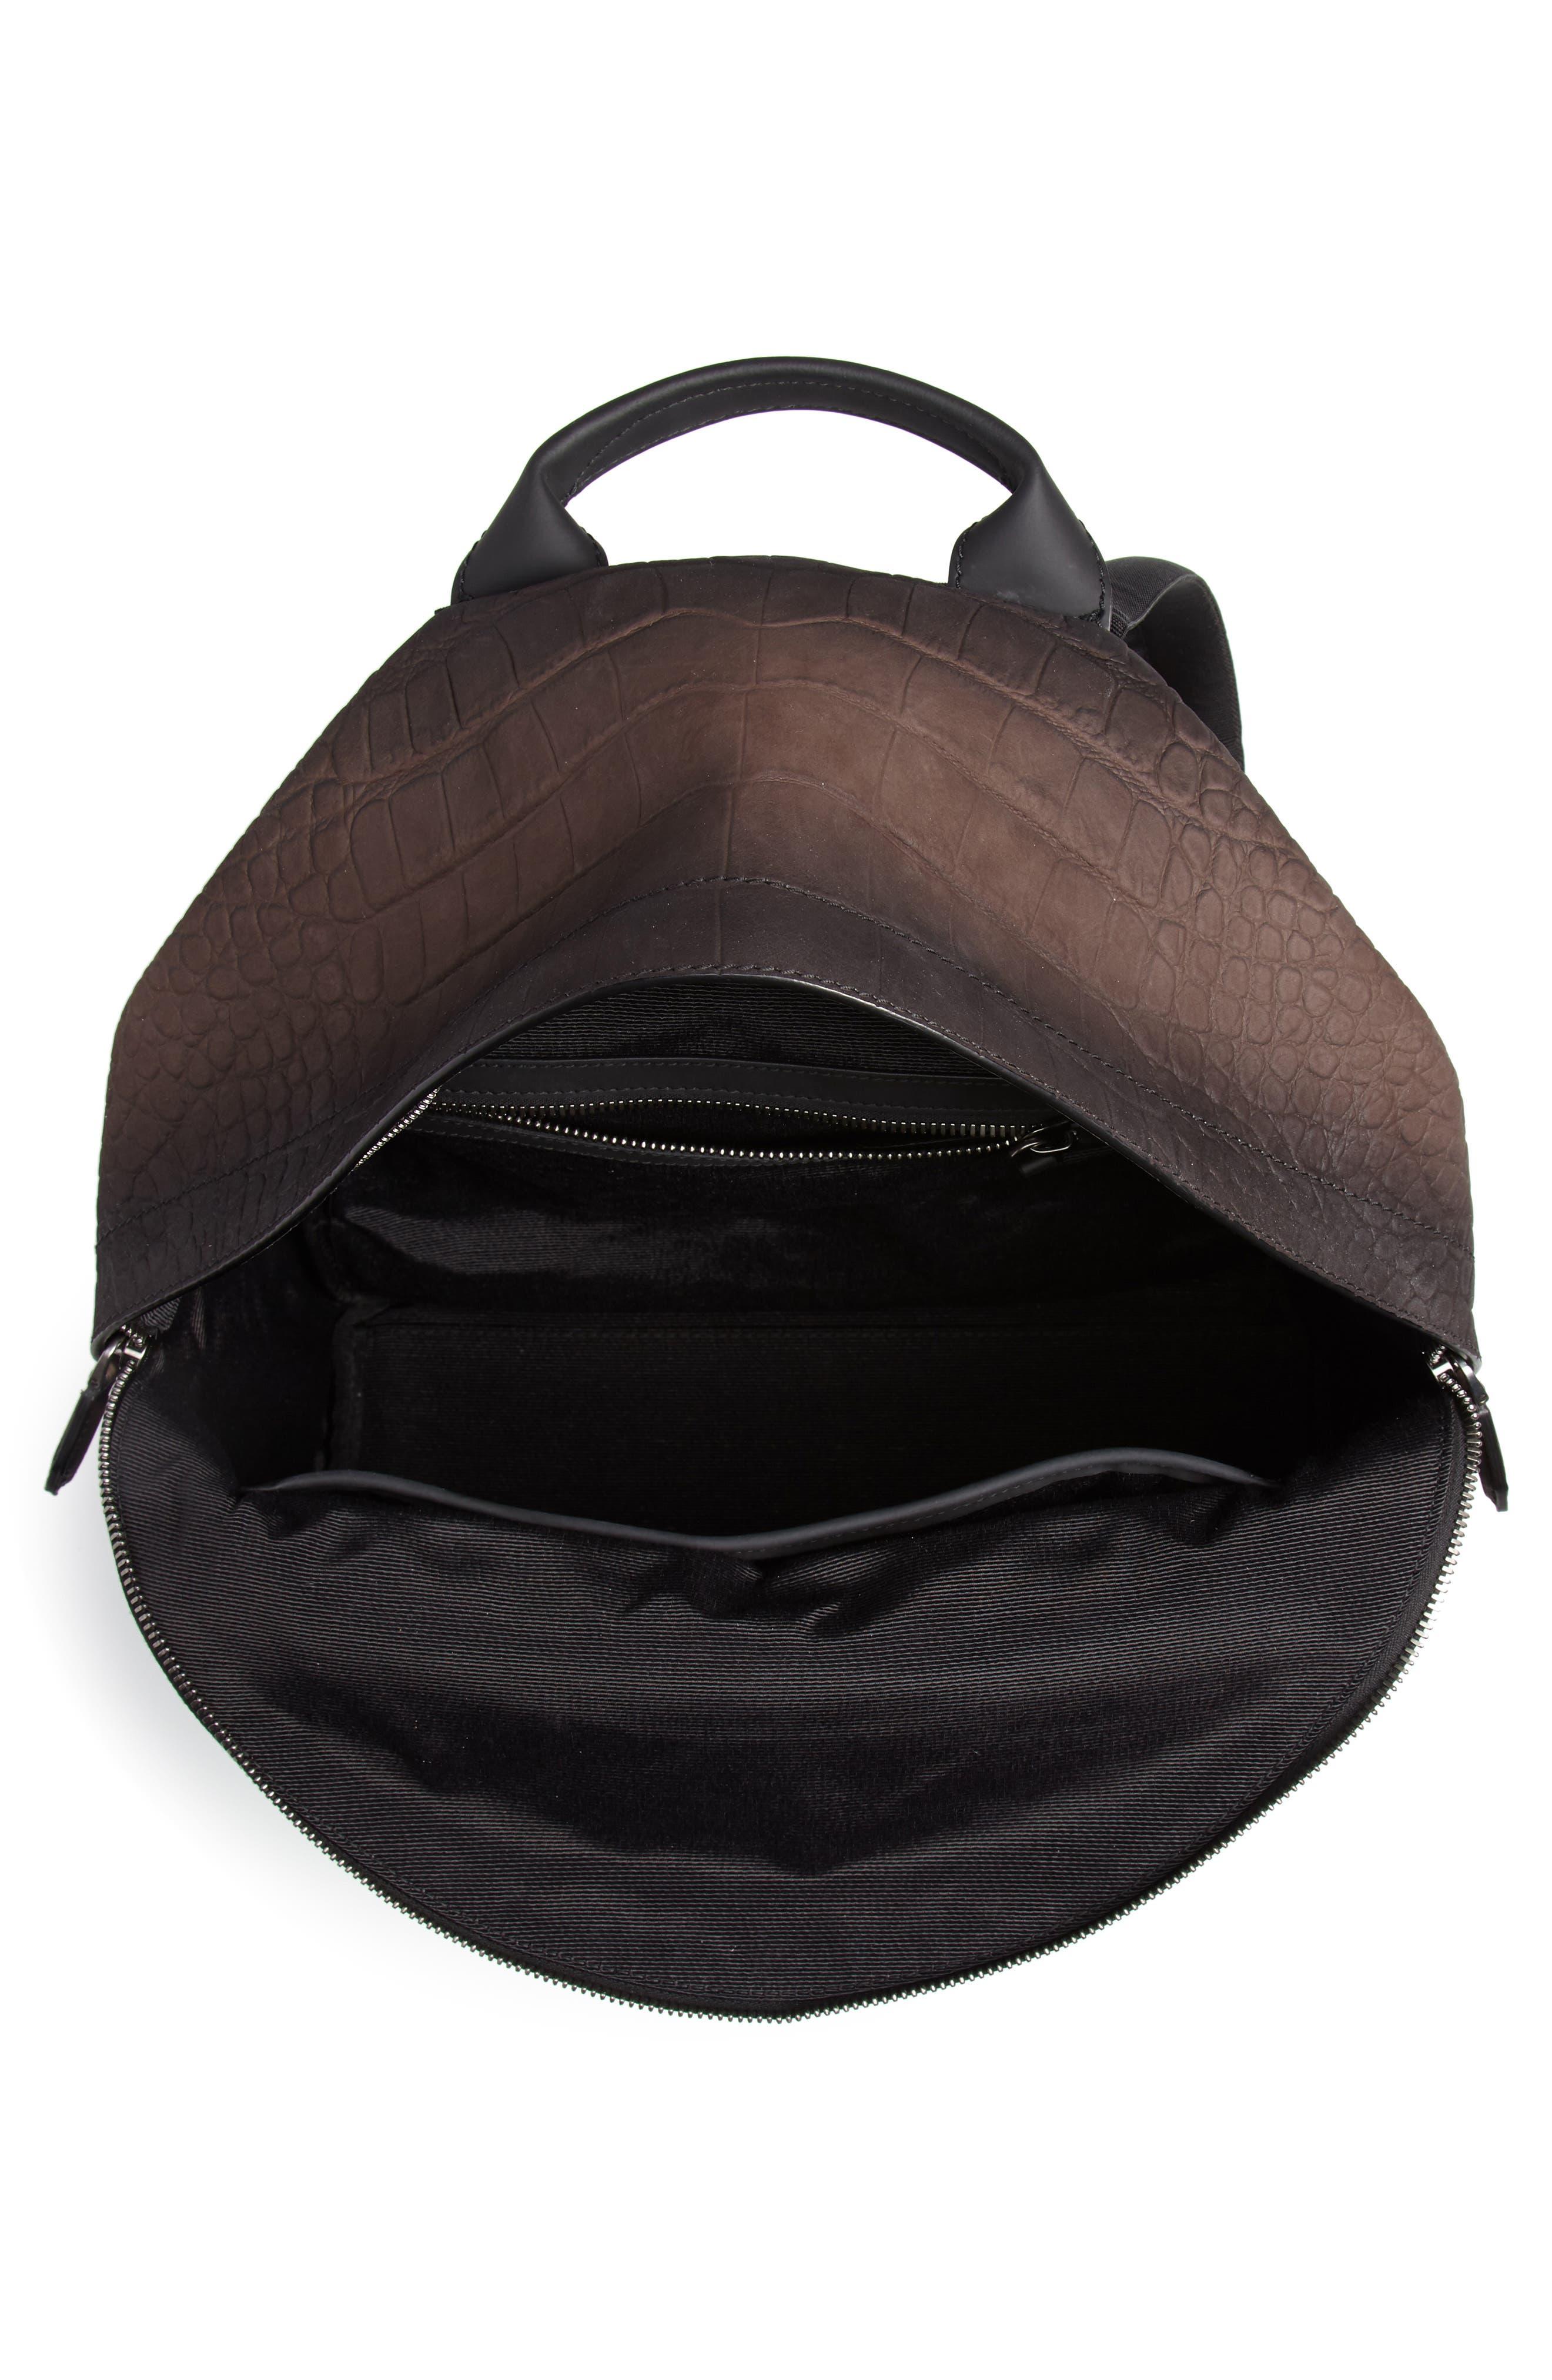 Firenze Leather Backpack,                             Alternate thumbnail 4, color,                             Moro